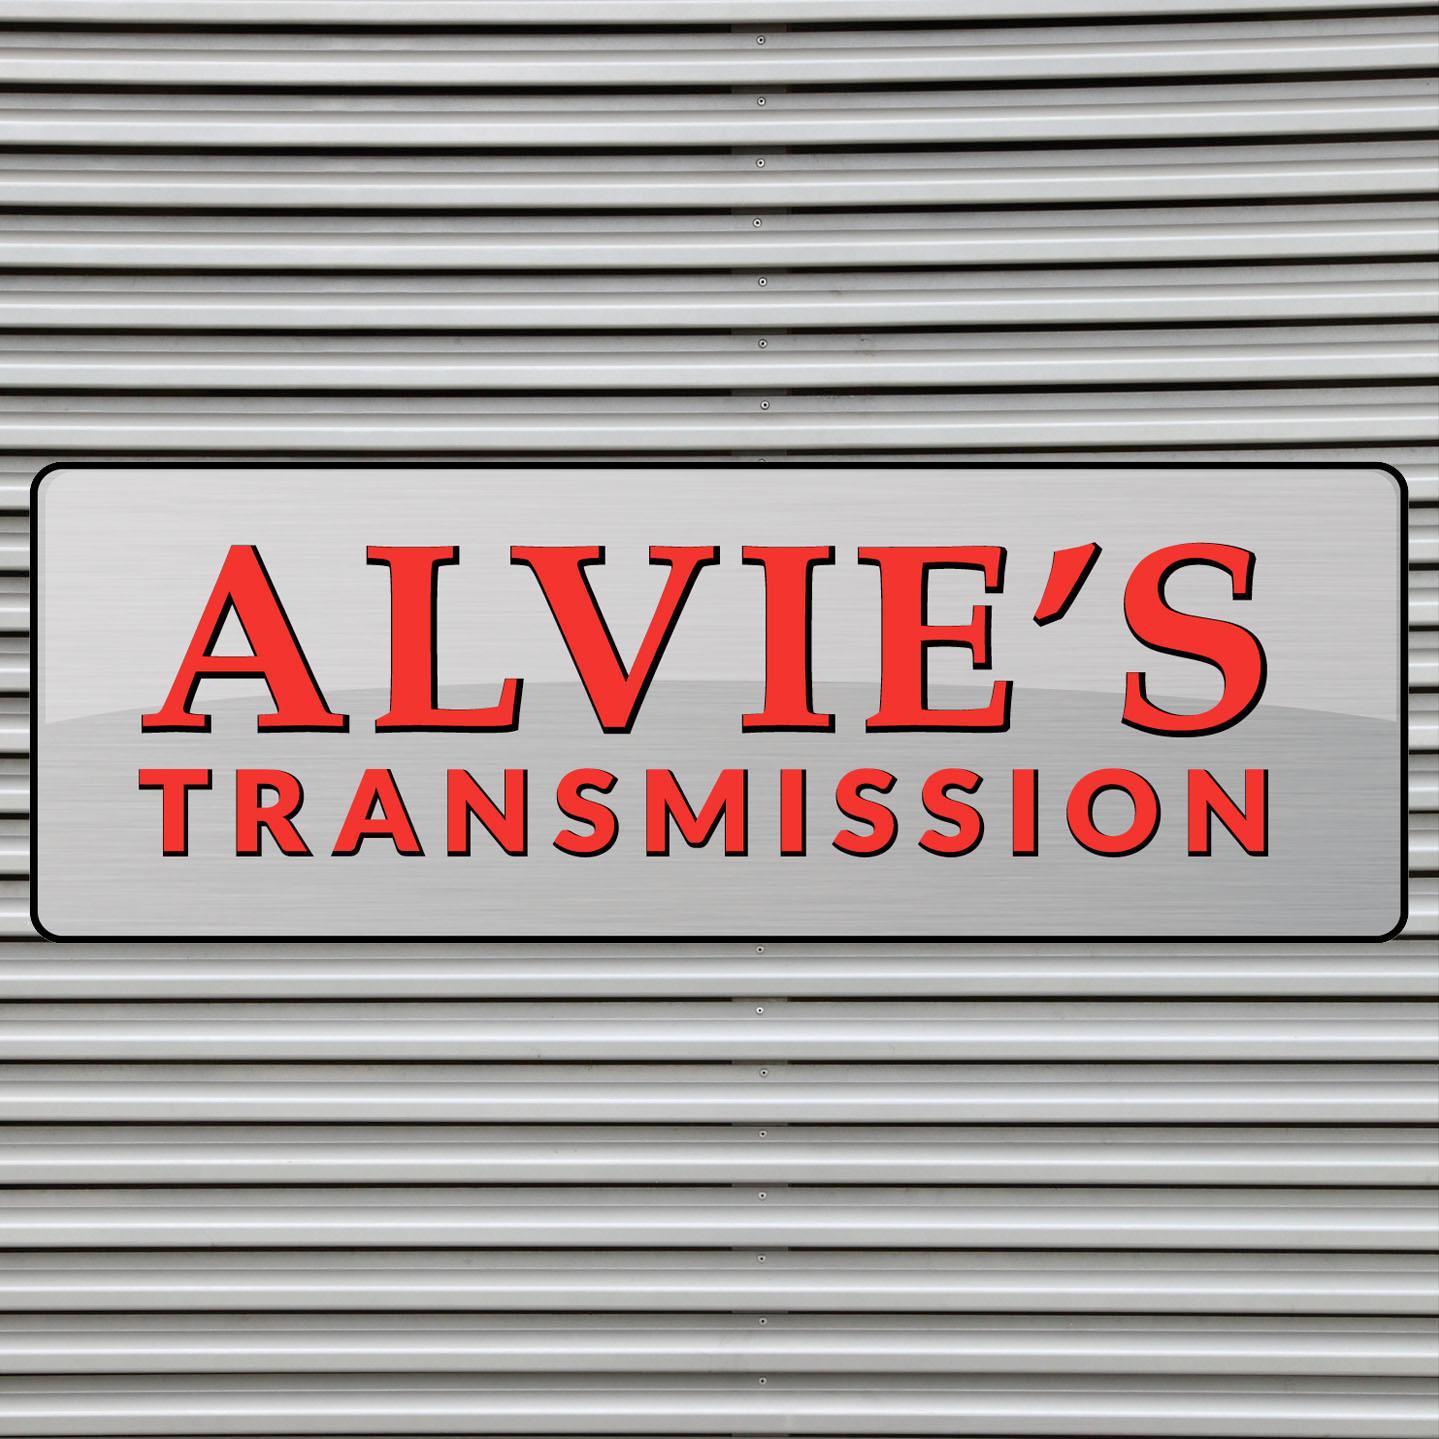 Alvie's Transmission